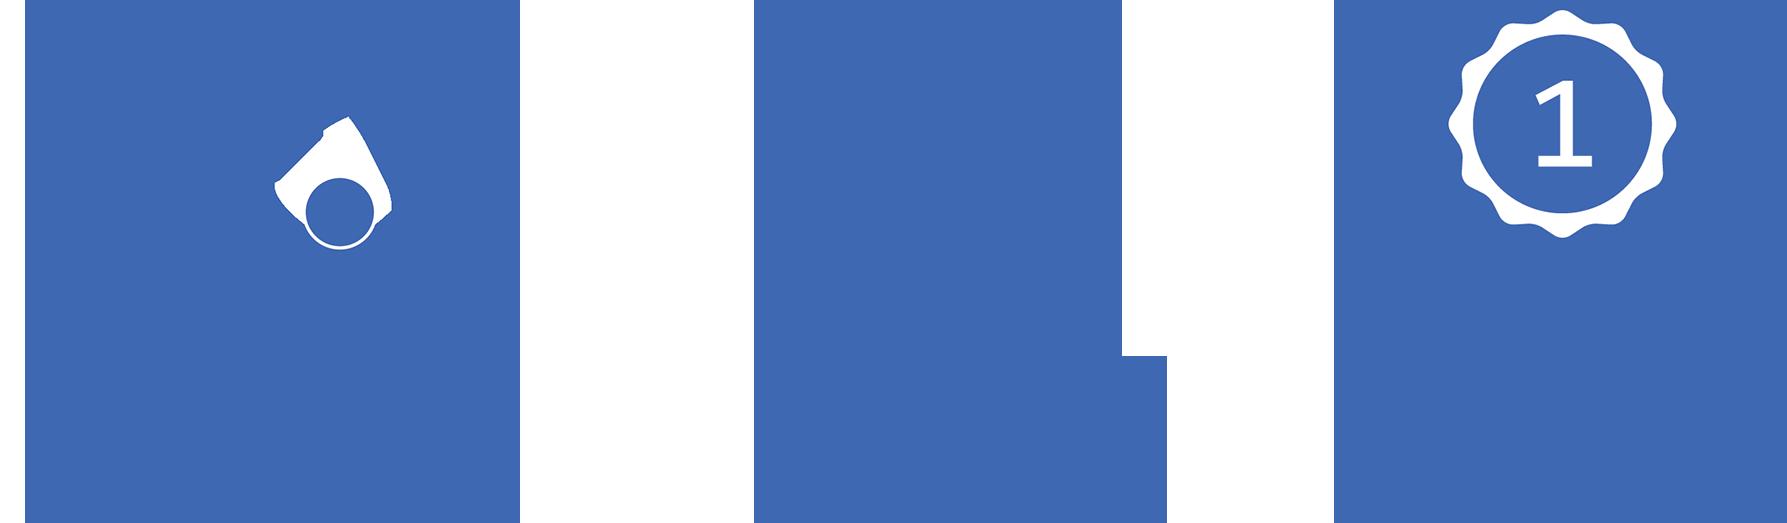 Reconversion - Formation - Centre d'excellence